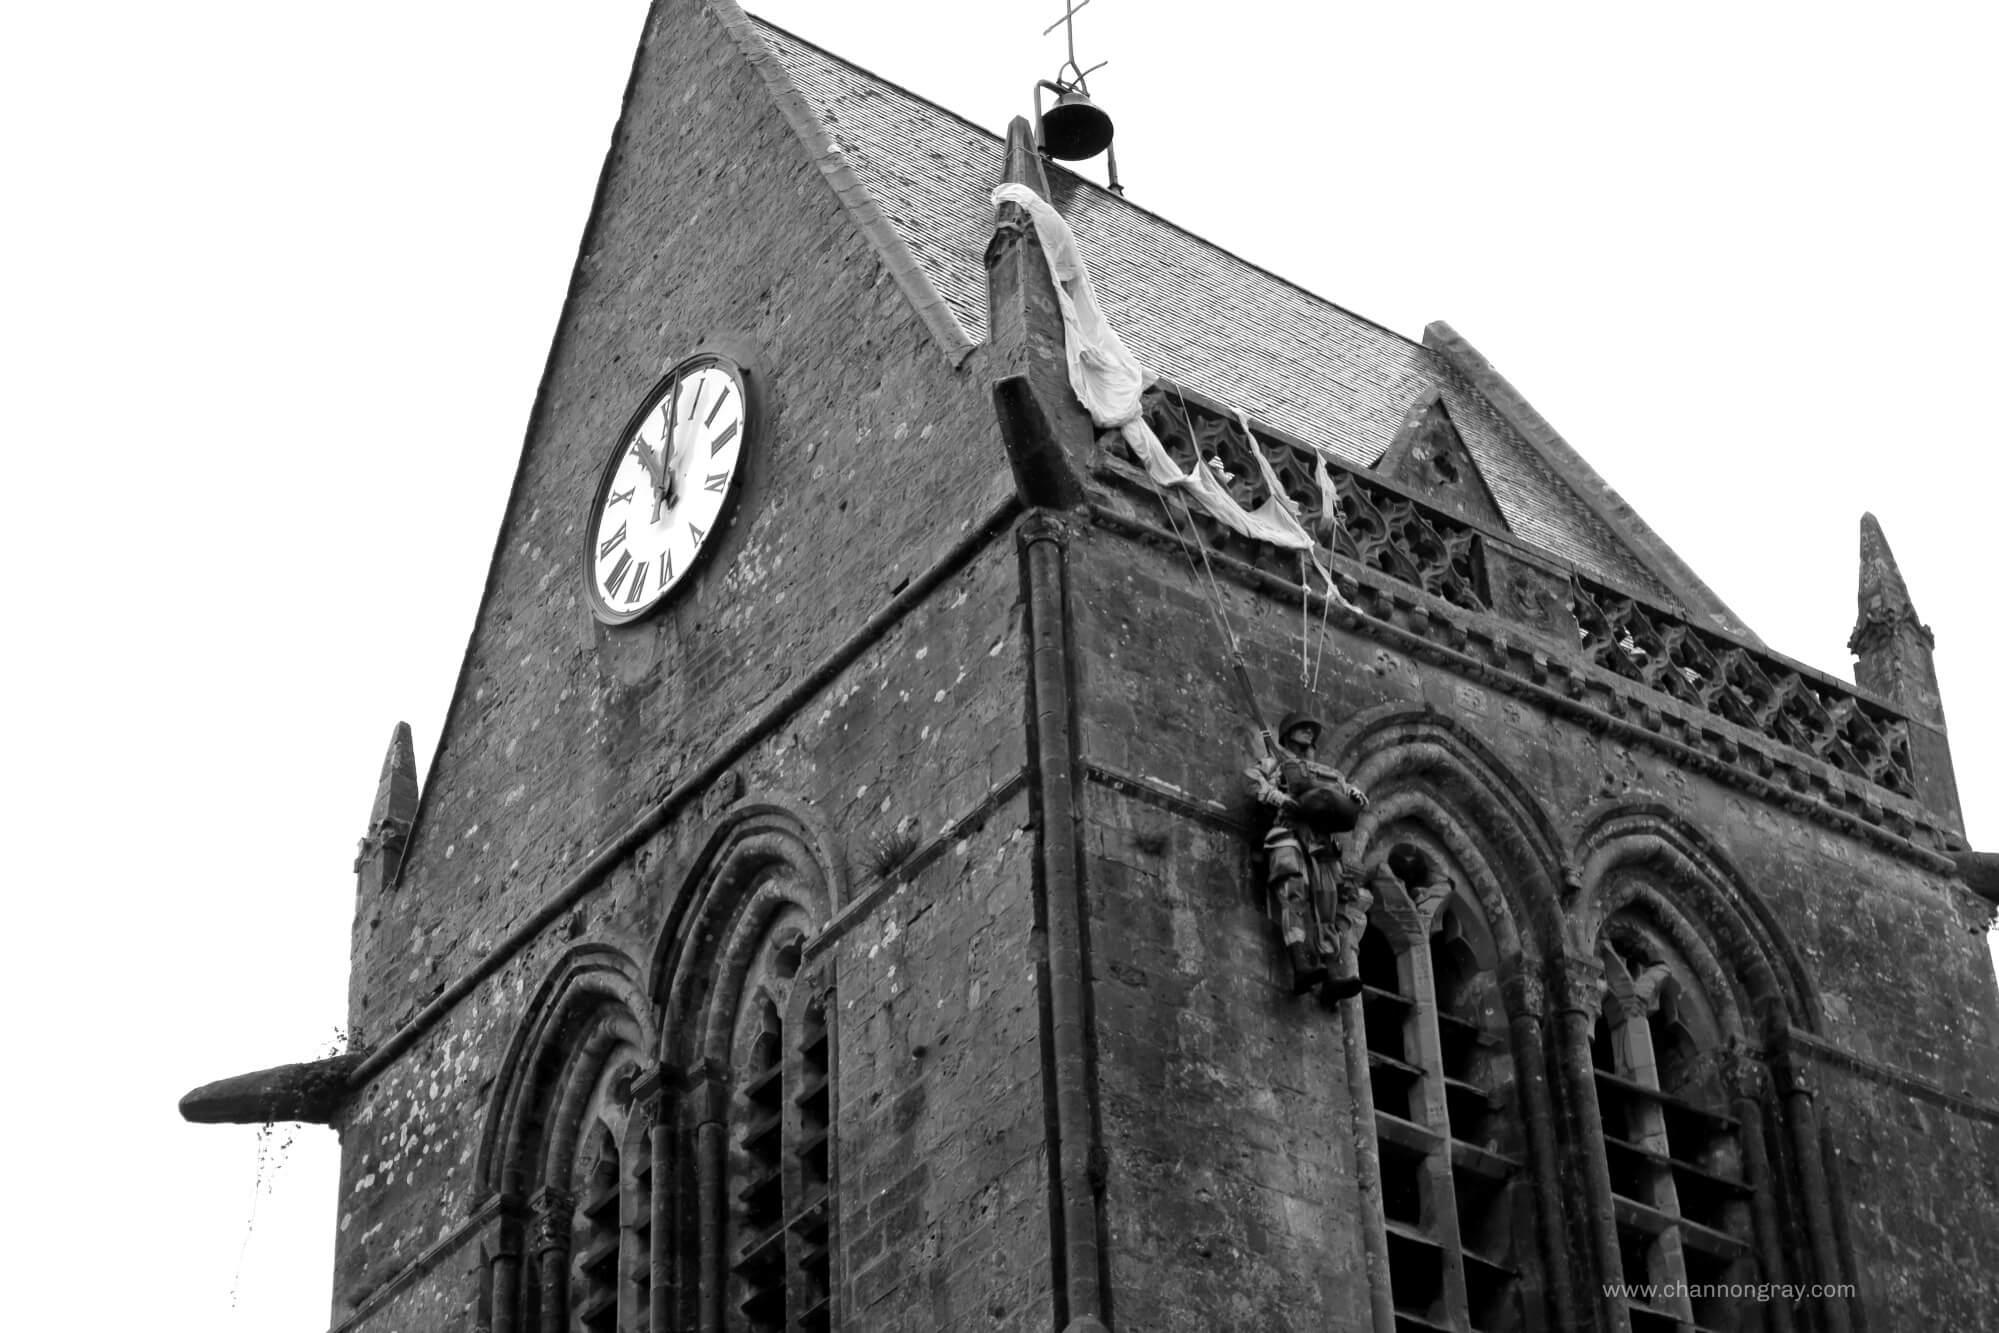 Sainte-Mere-Eglise France